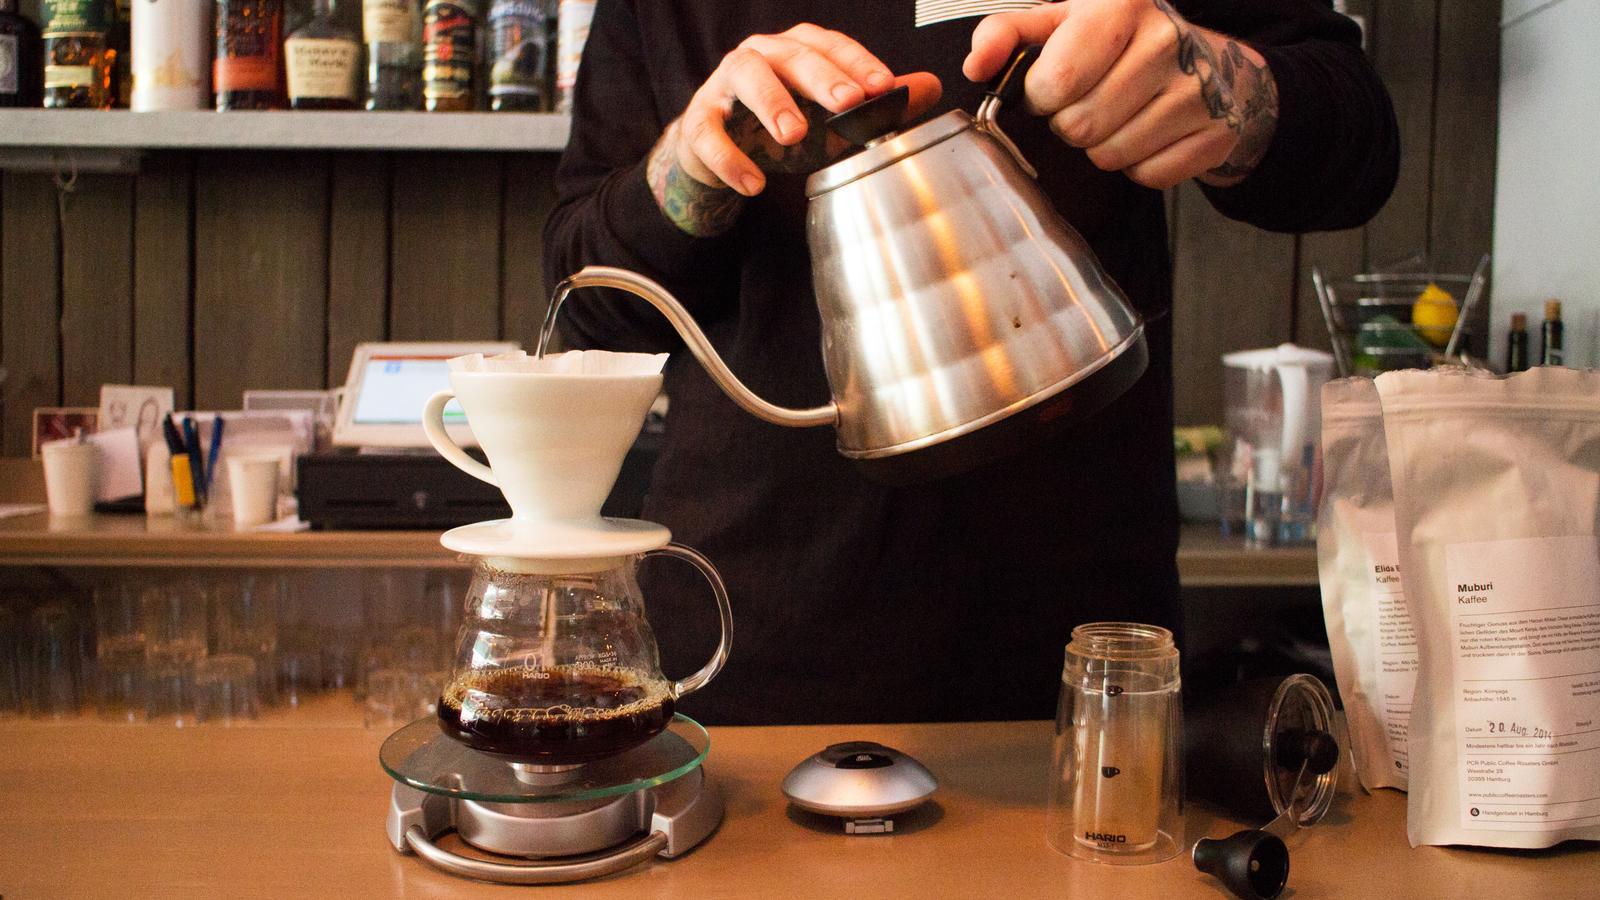 Filterkaffee Aufguss